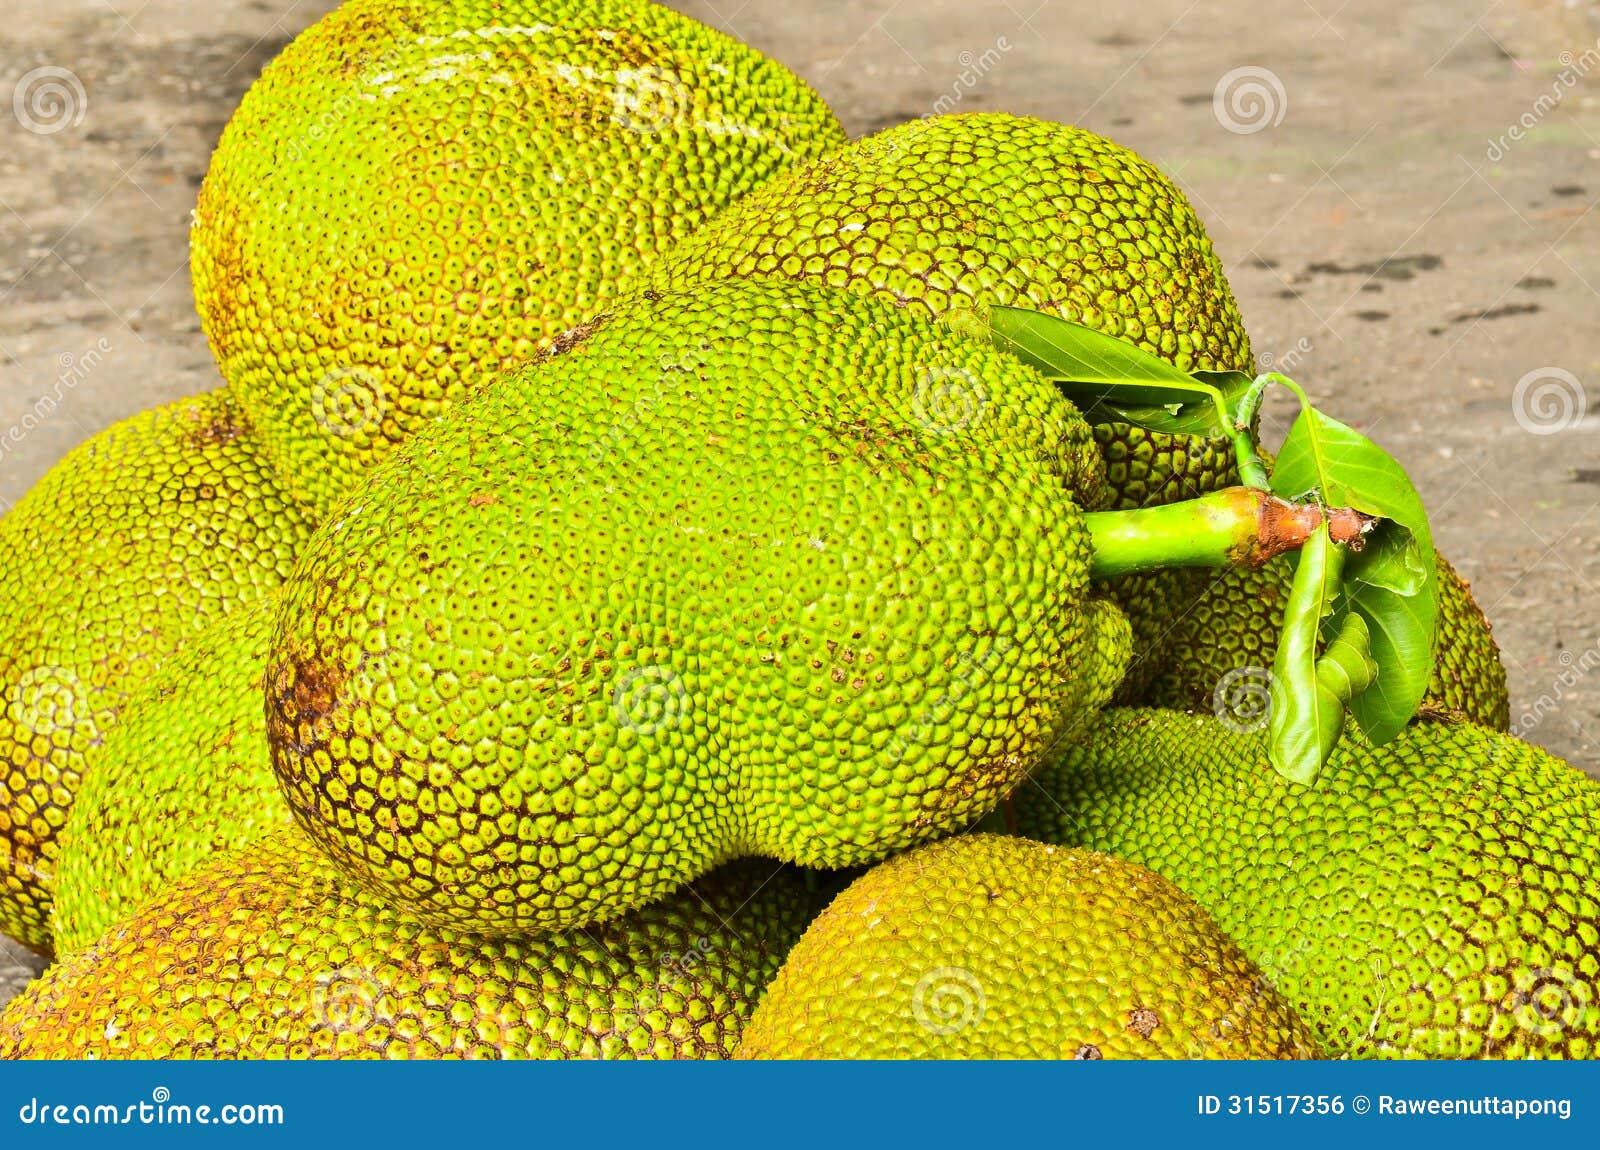 how to open a jackfruitn